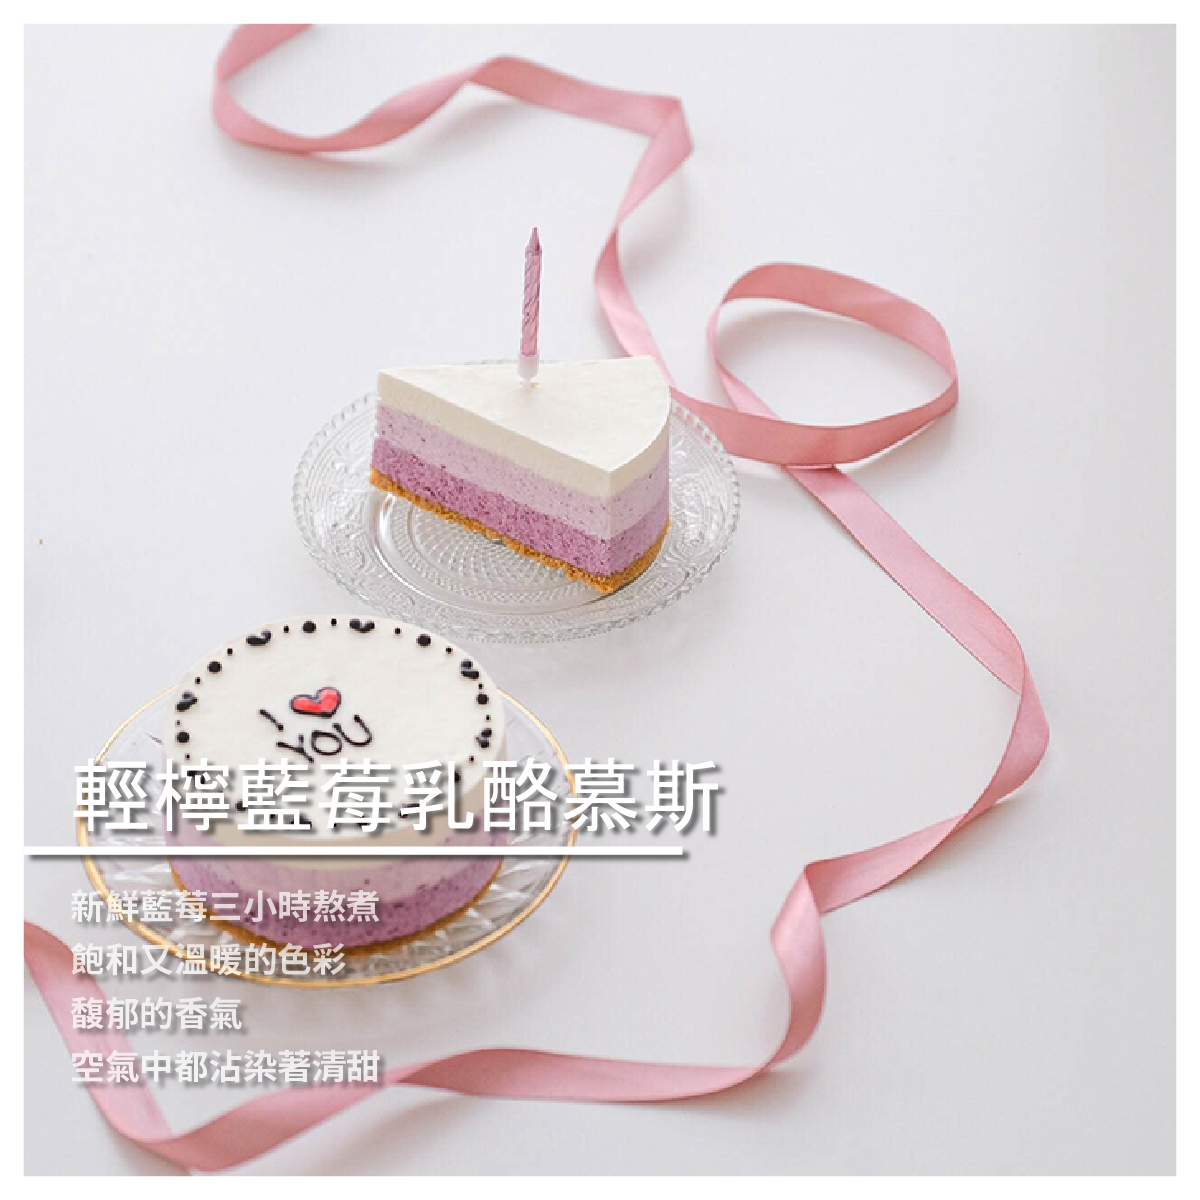 【 M'uu Cake霂克】輕檸藍莓乳酪慕斯 4吋